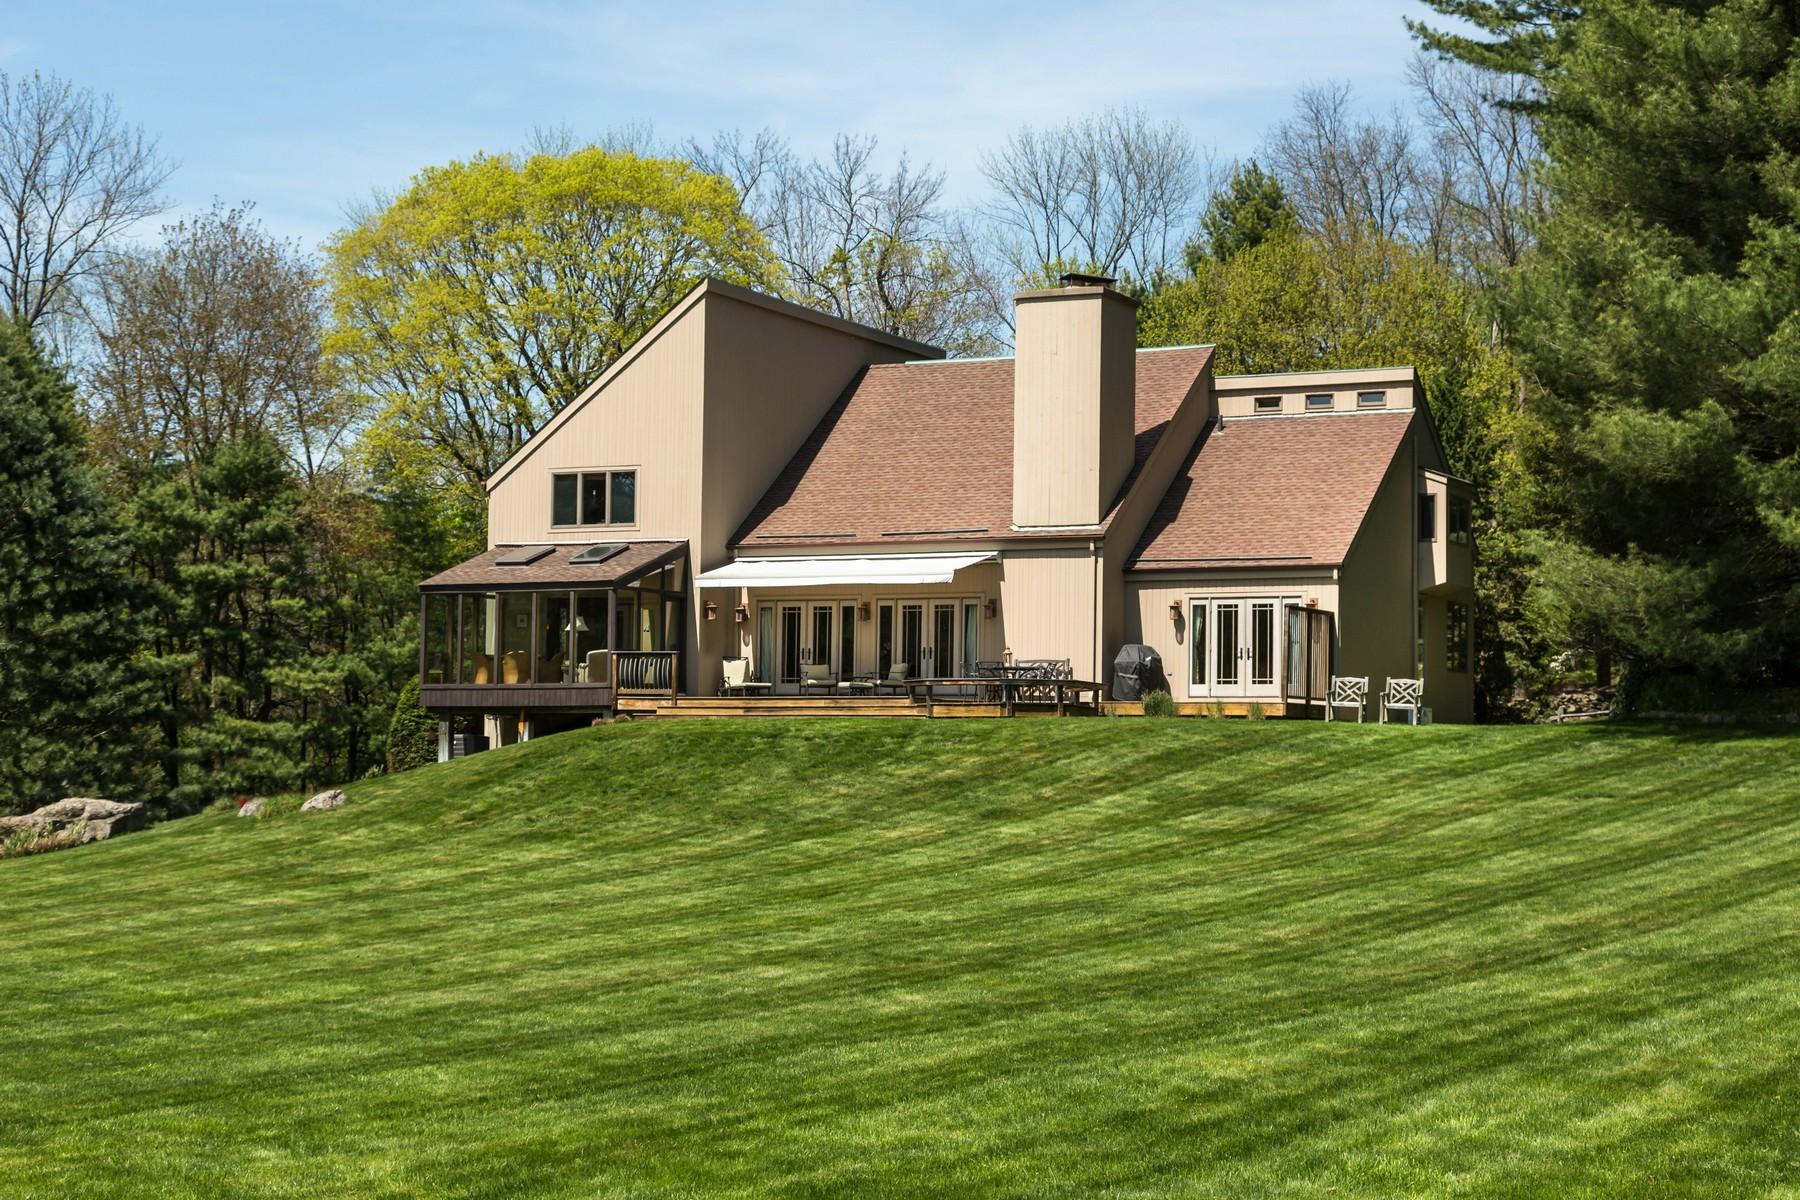 獨棟家庭住宅 為 出售 在 Sophisticated Greenfield Hill Contemporary 1313 Old Academy Road, Fairfield, 康涅狄格州, 06824 美國